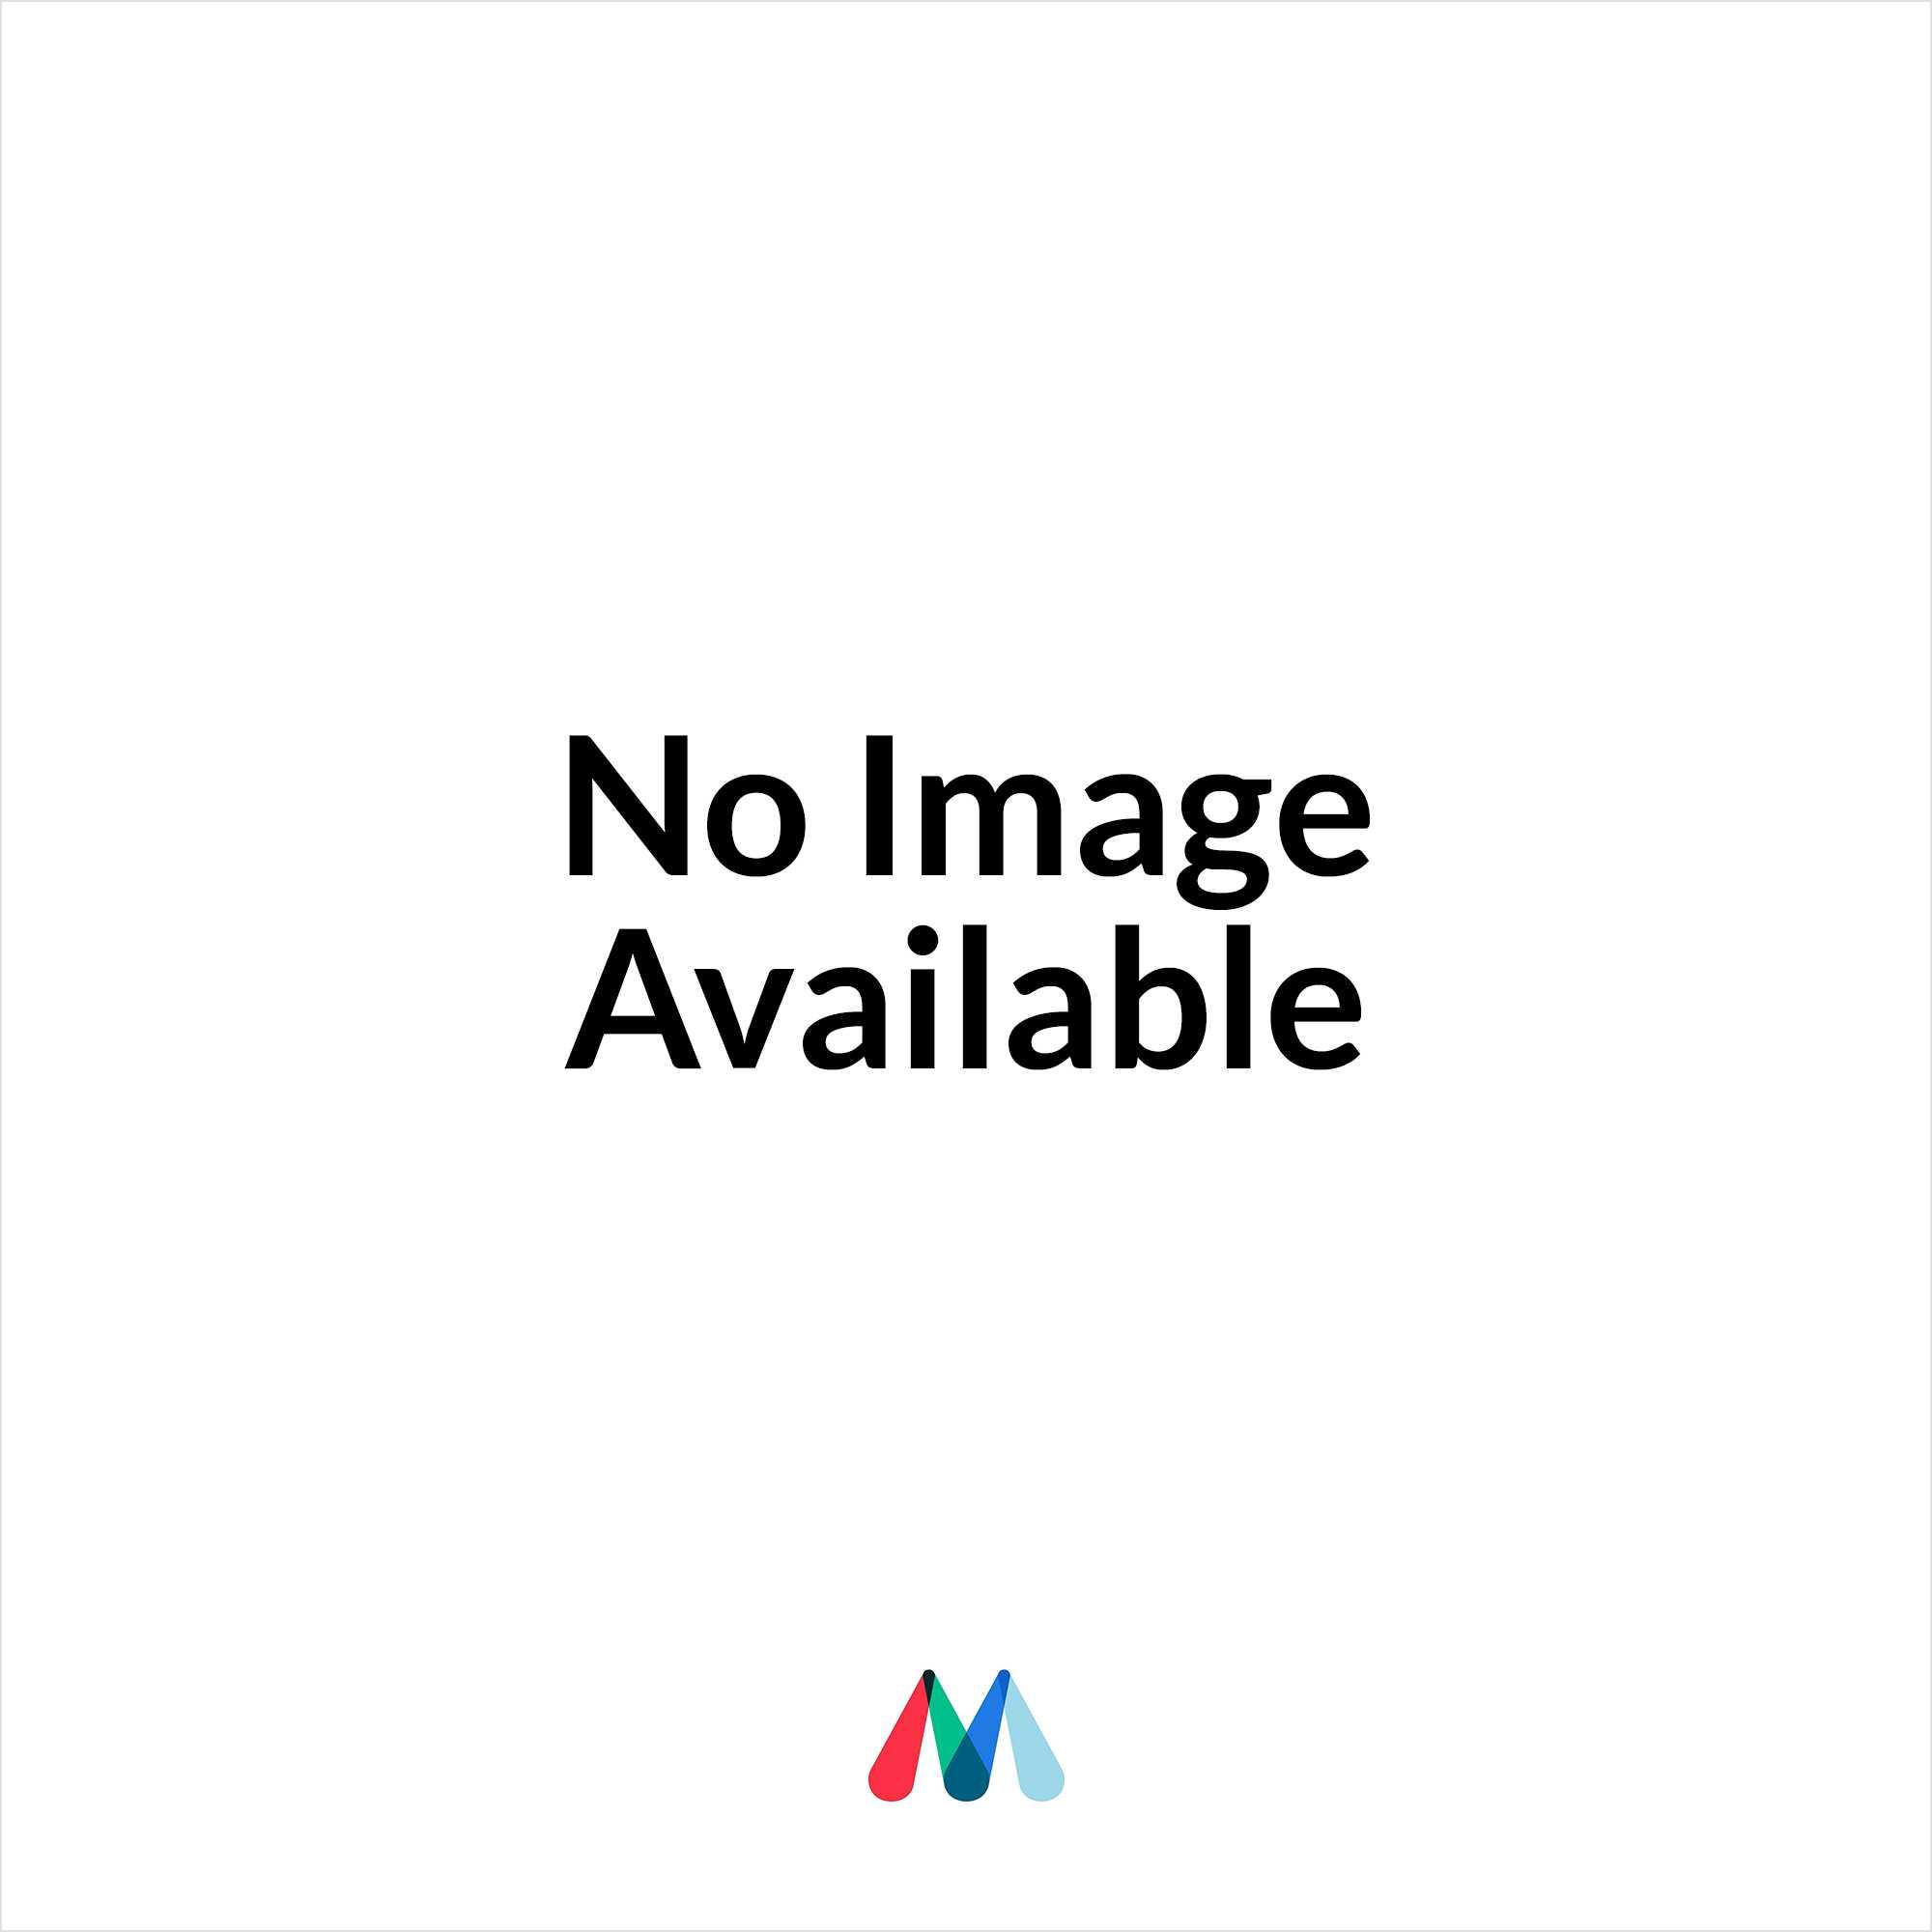 Tiffany Glass Ingram single wall fitting